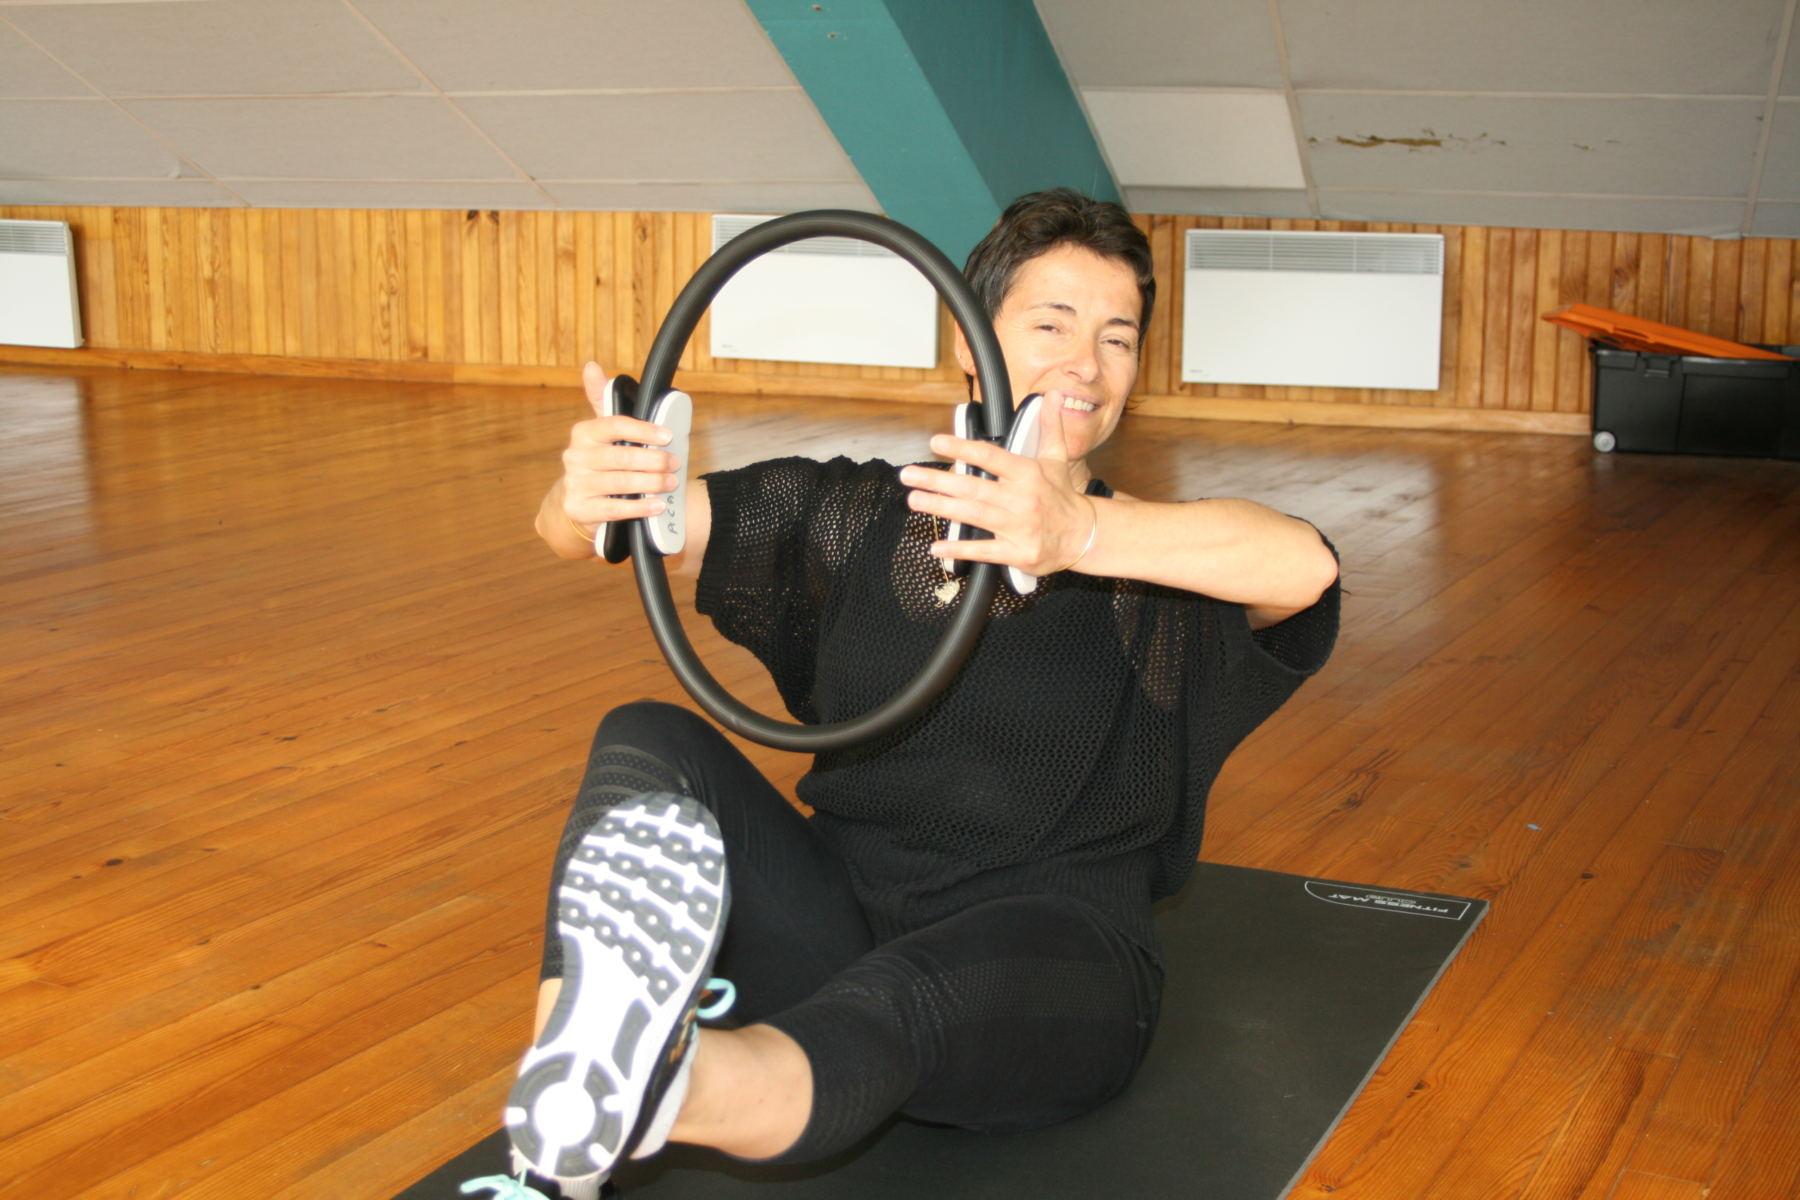 ACAD - Activité Stretching